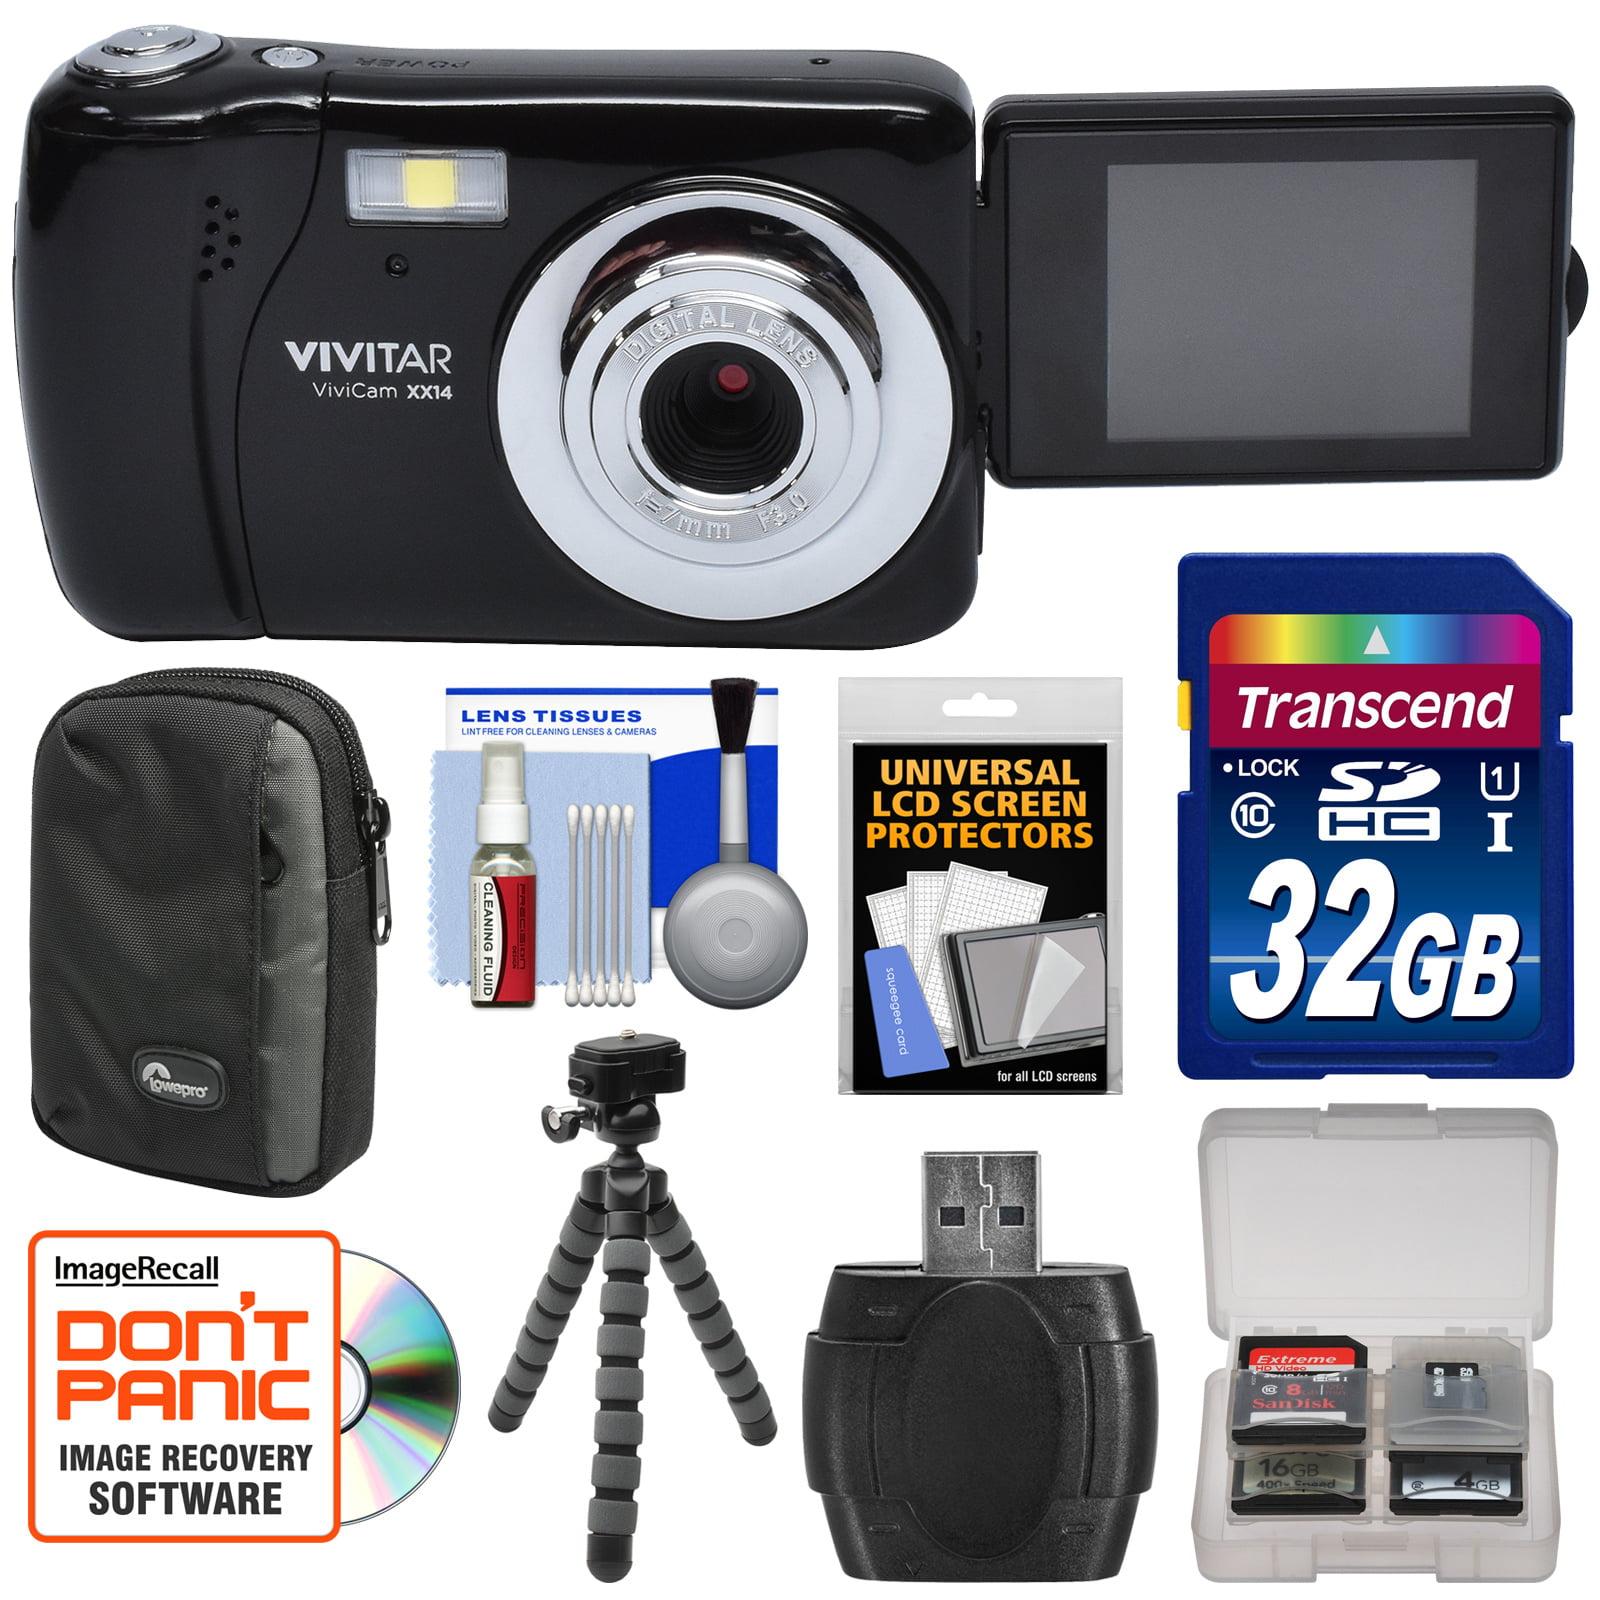 Vivitar ViviCam VXX14 Selfie Digital Camera (Black) with 32GB Card + Case + Flex Tripod + Reader + Kit by Vivitar